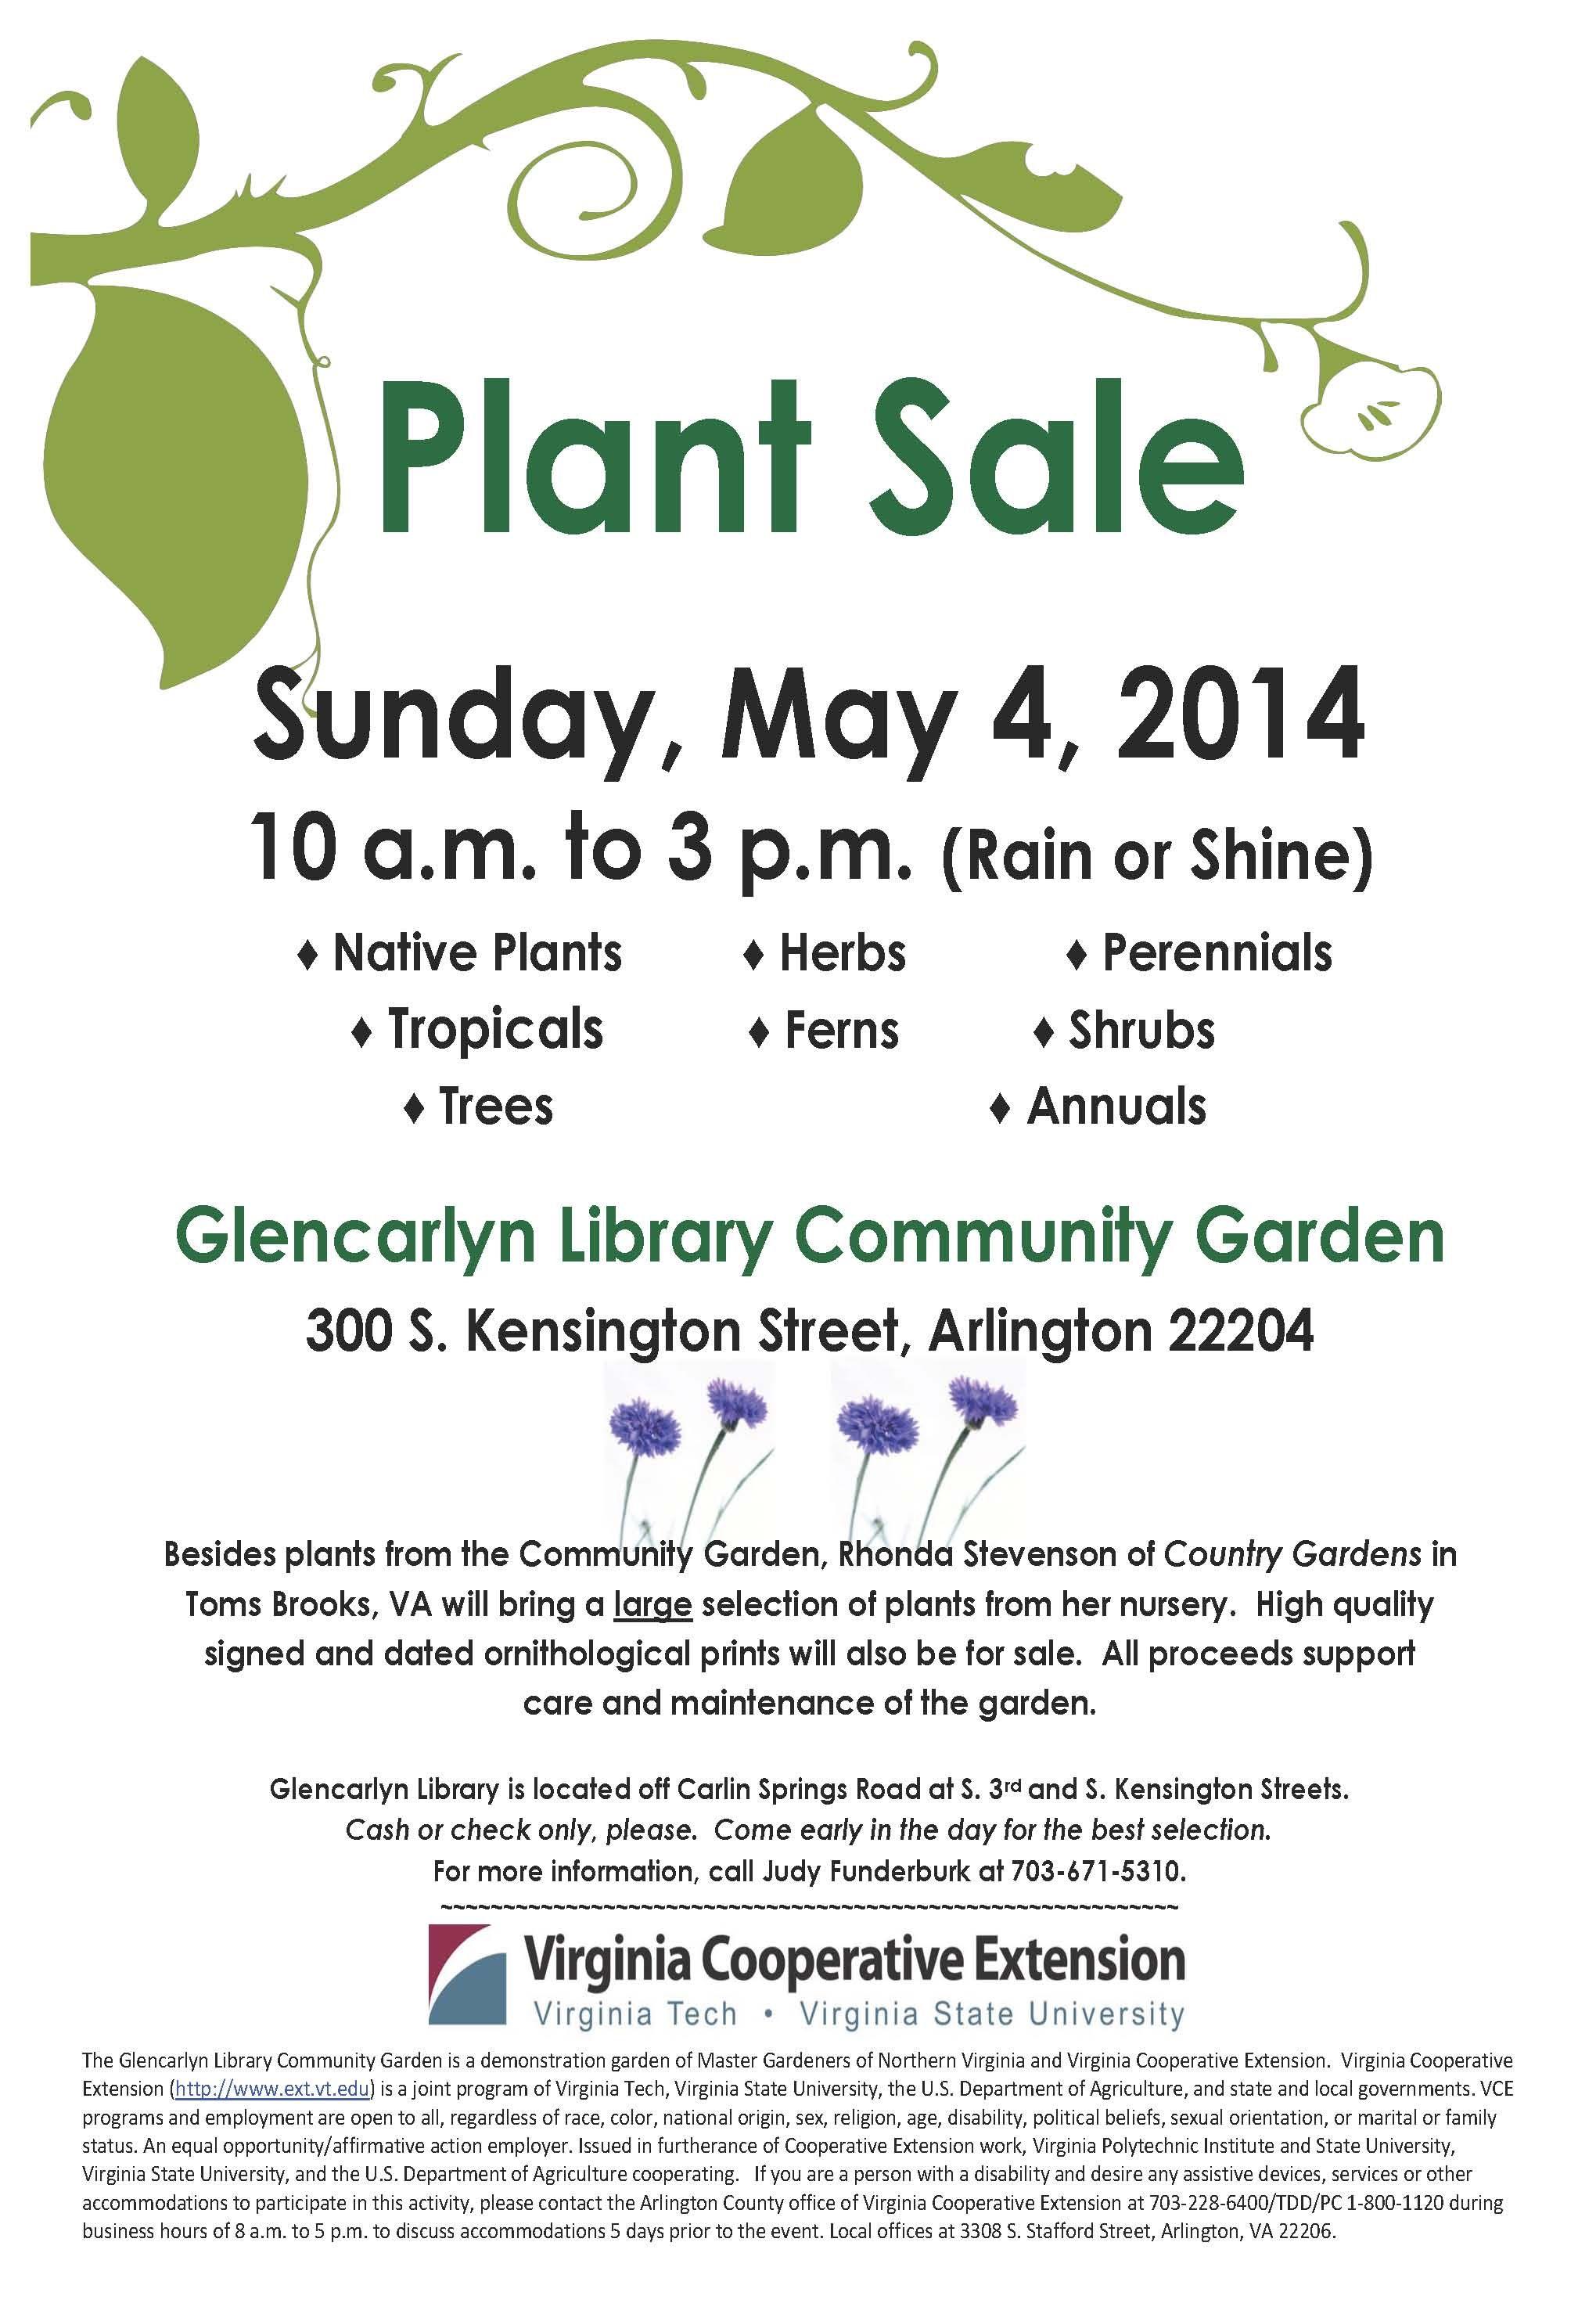 7449d2feb12694937489d21aa9be9061 - Washington County Master Gardeners Plant Sale